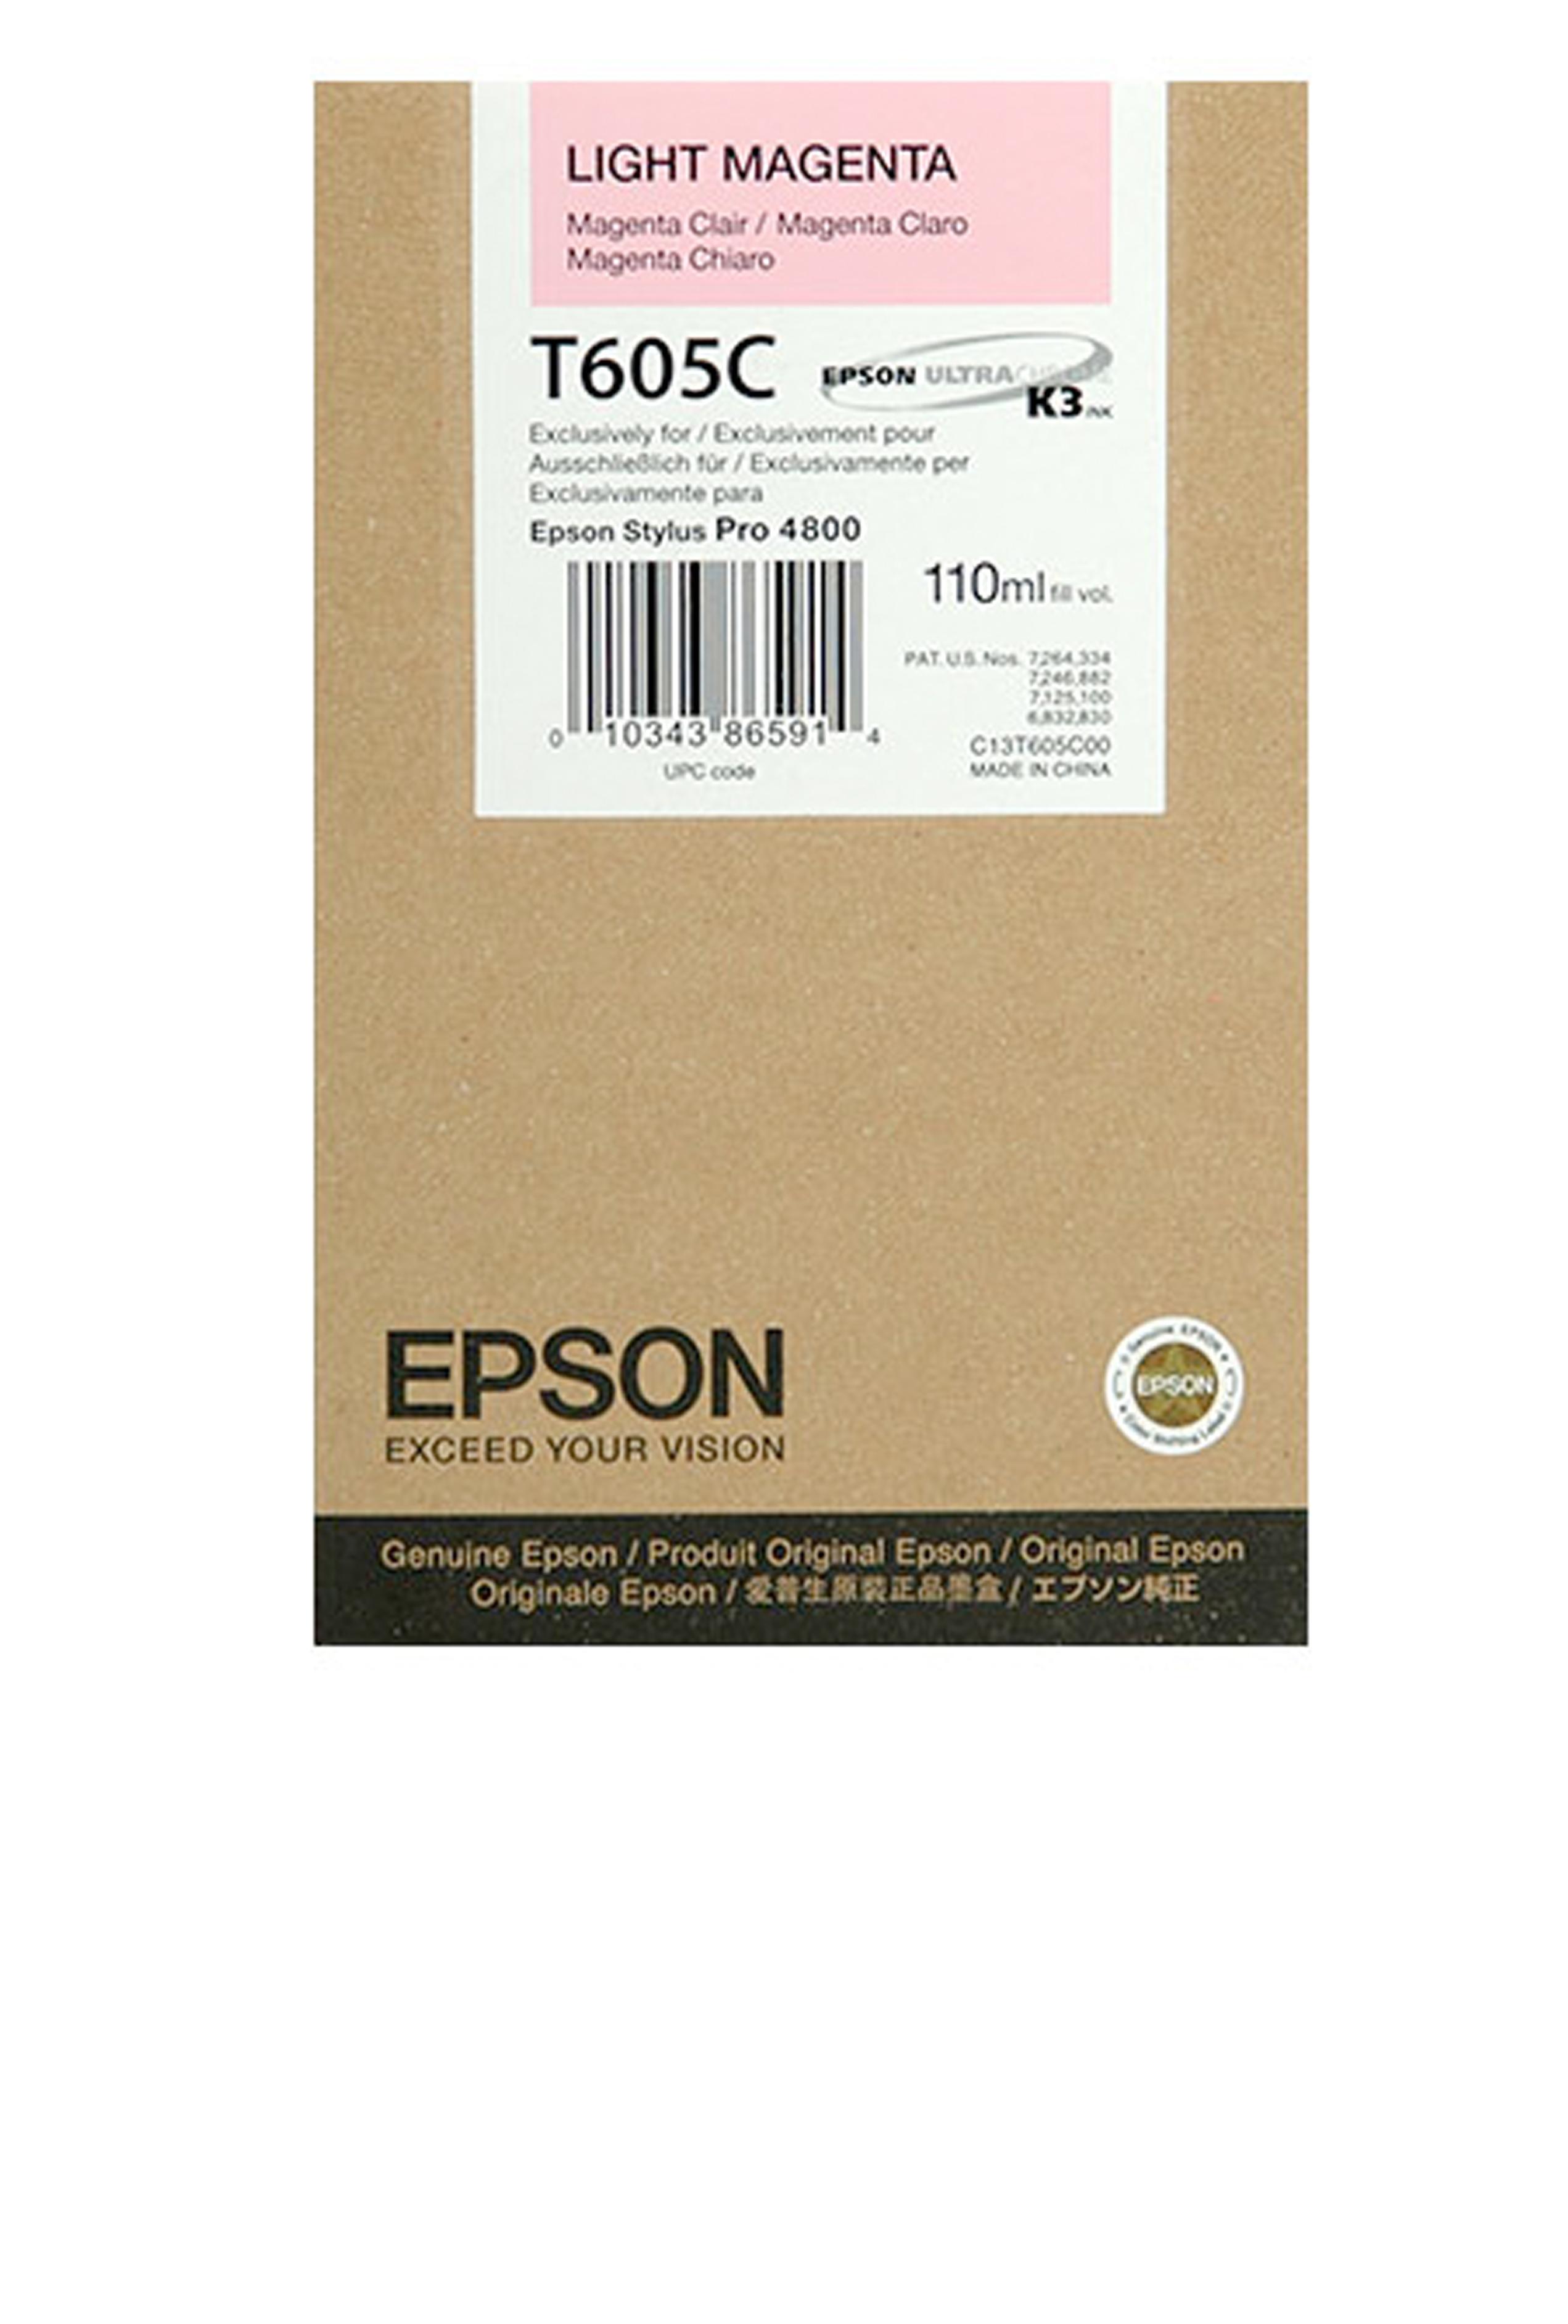 Epson EPSON SD LT MAGENTA INK (110 ML) (T605C00)